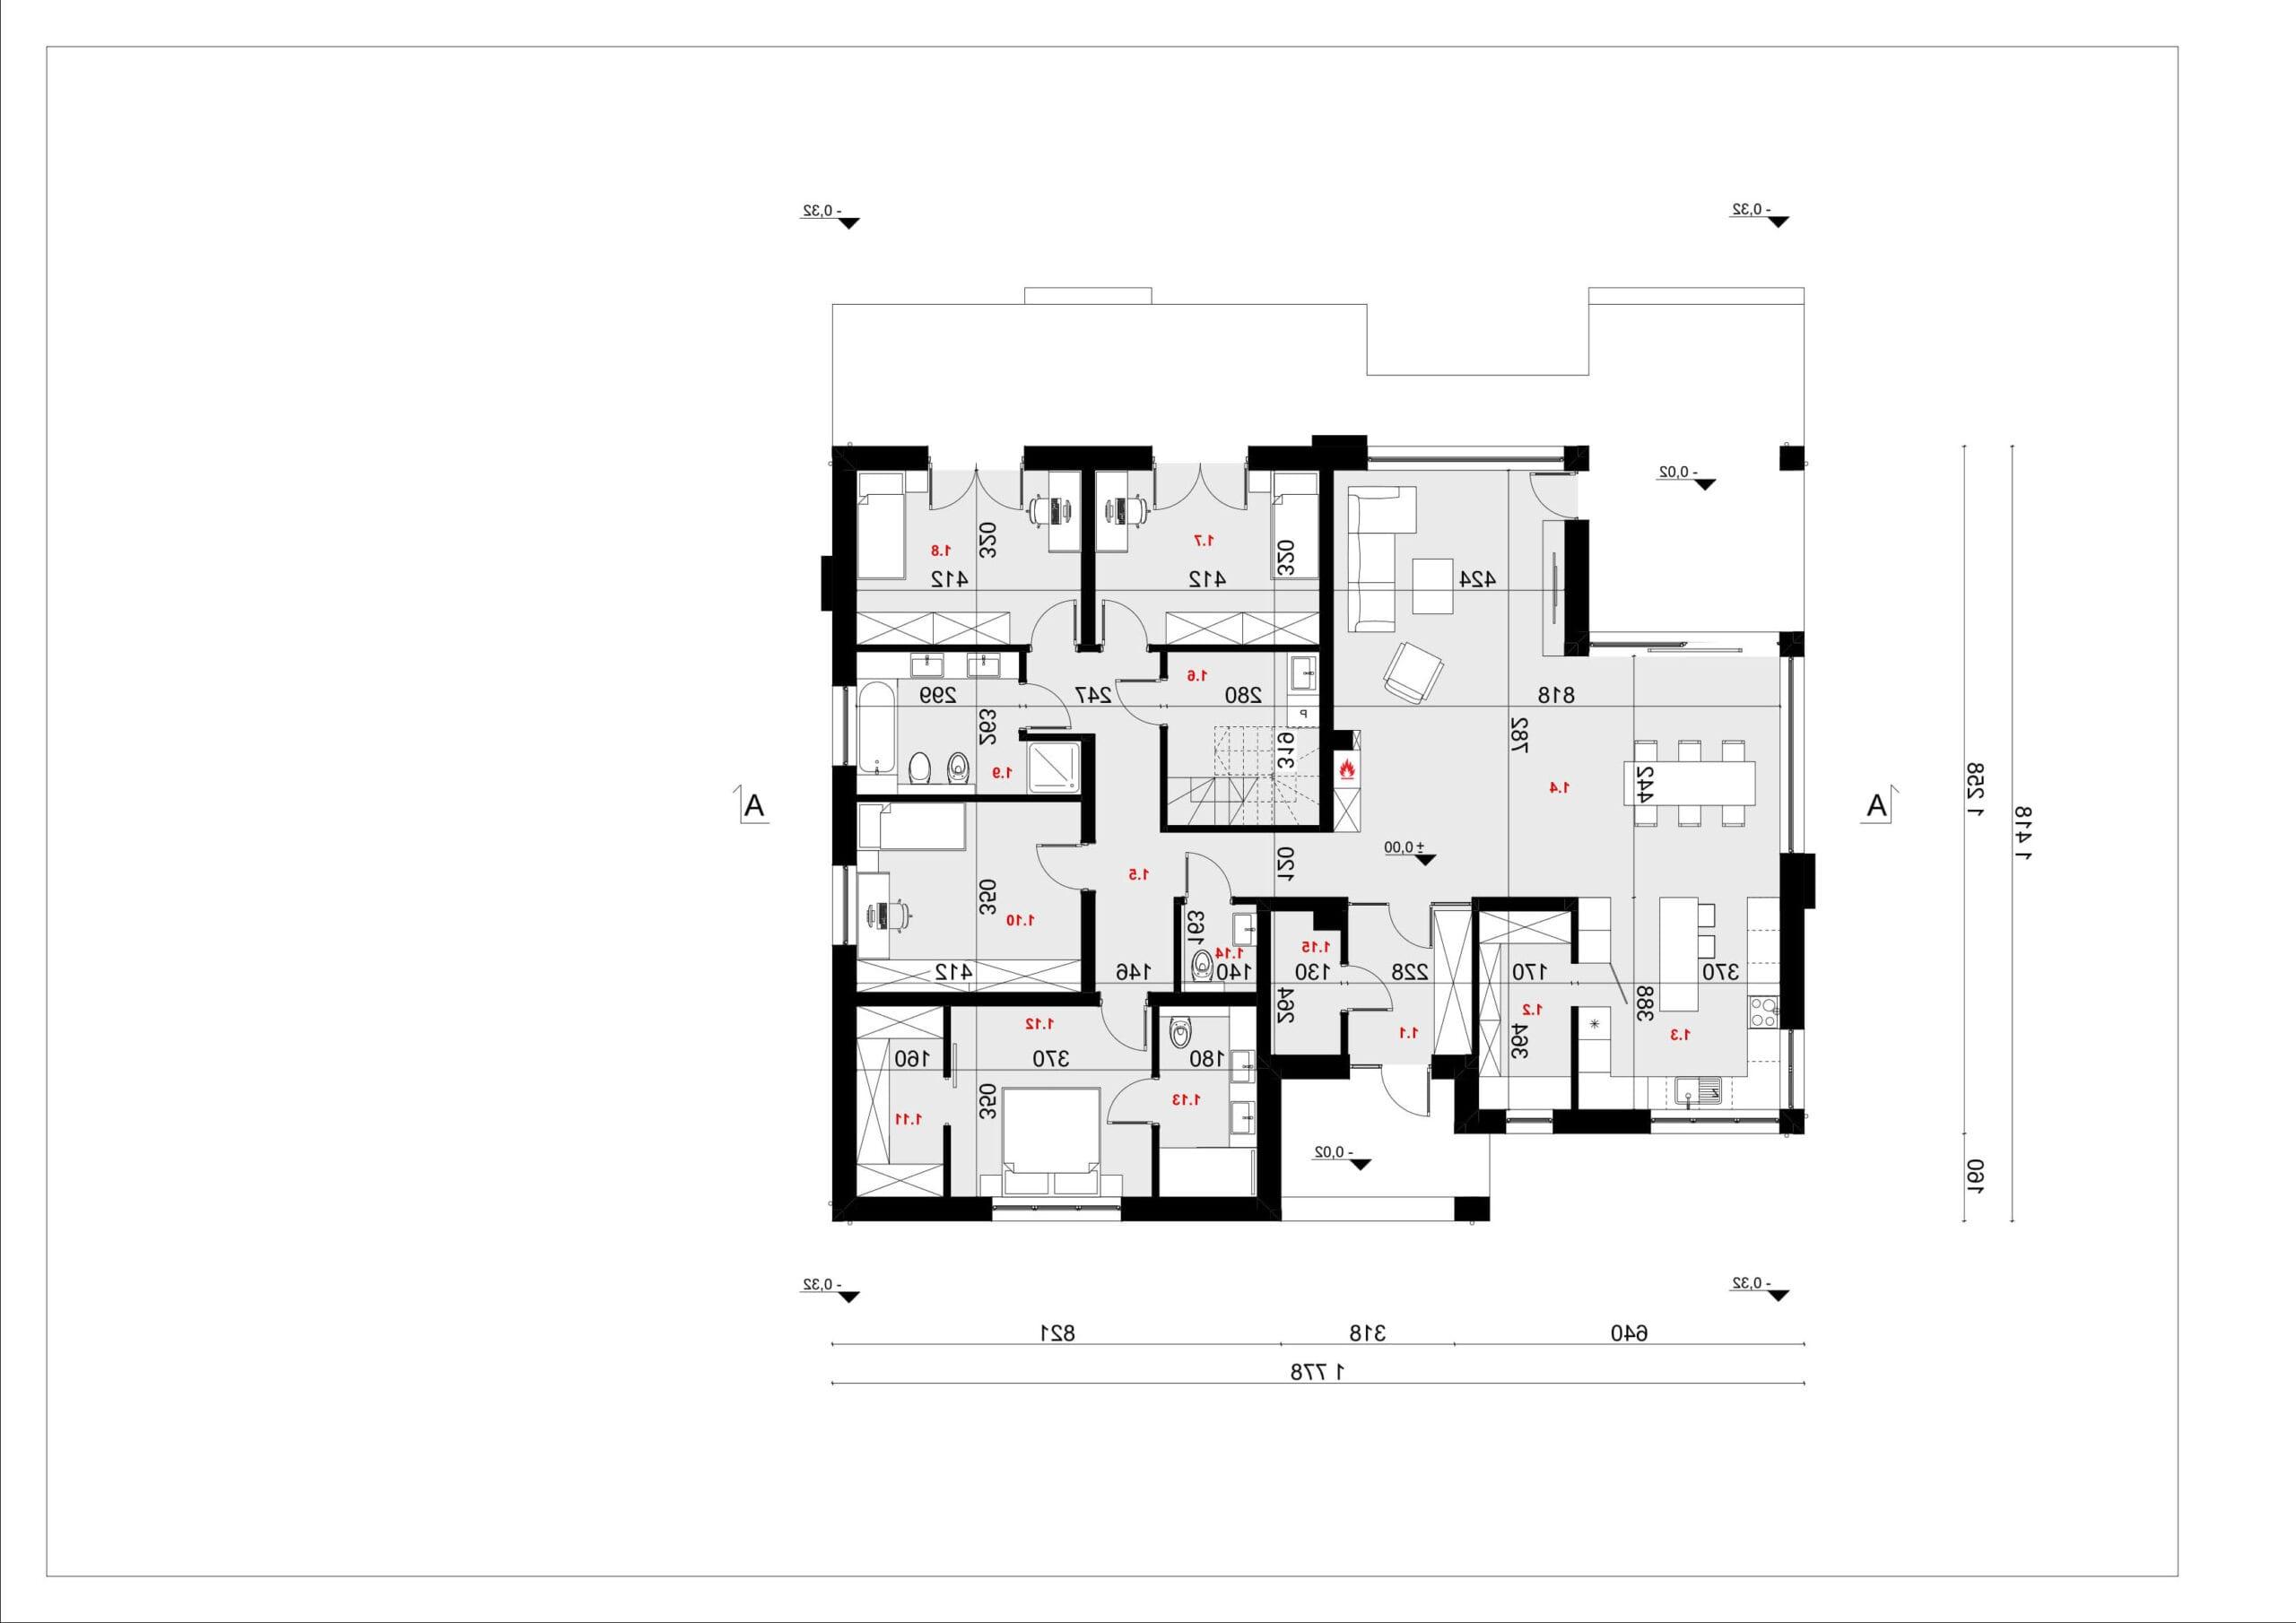 RZUT PARTERU - projekt domu SEJ-PRO 086 ENERGO - odbicie lustrzane